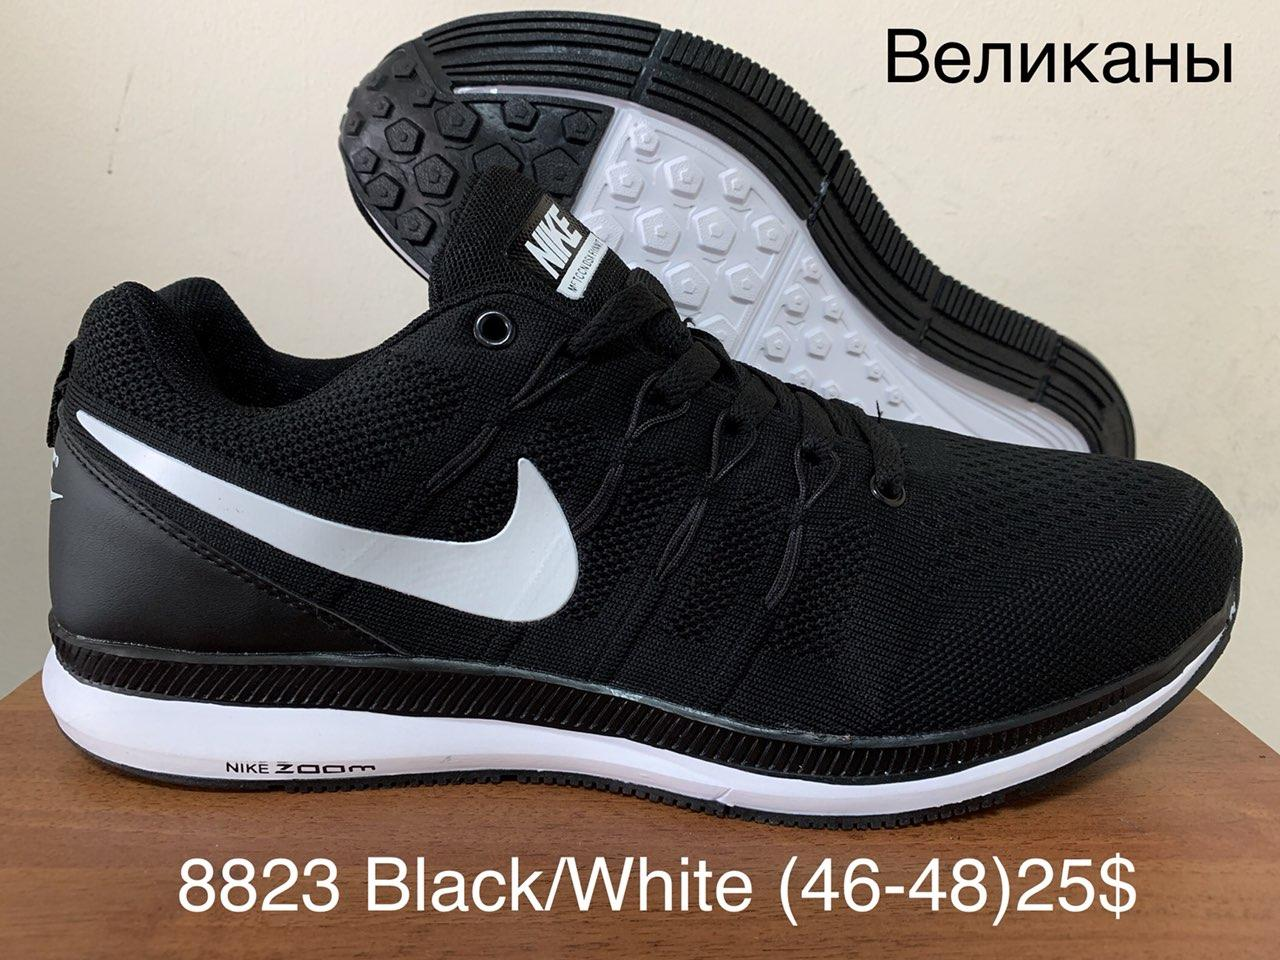 75b26bd6 Мужские кроссовки Nike великаны Nike Zoom оптом (46-48) - Интернет-магазин